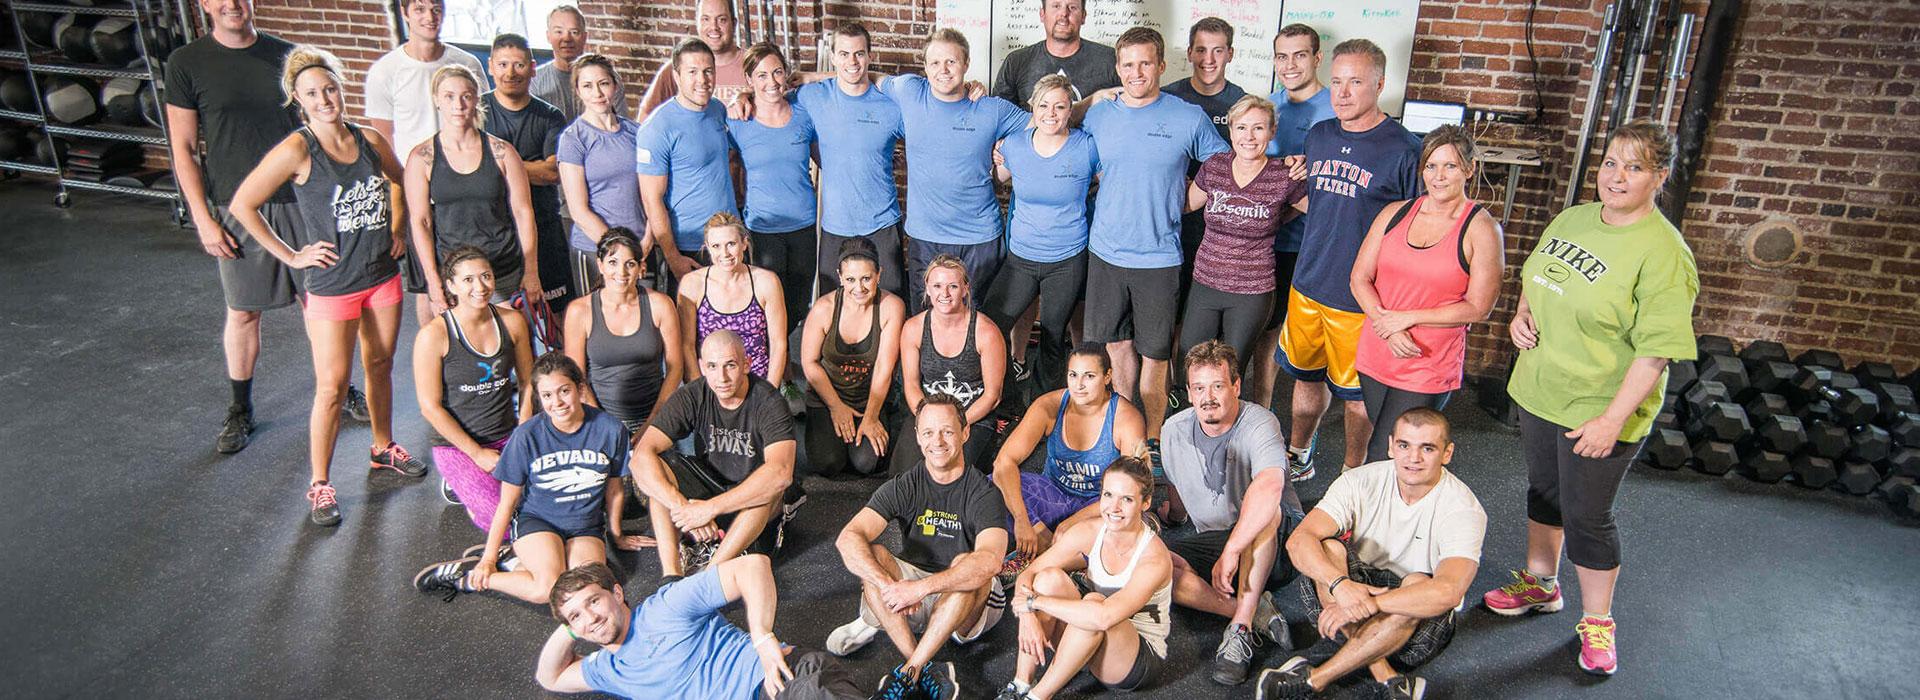 CrossFit Training near Reno NV, CrossFit Training near Sparks NV